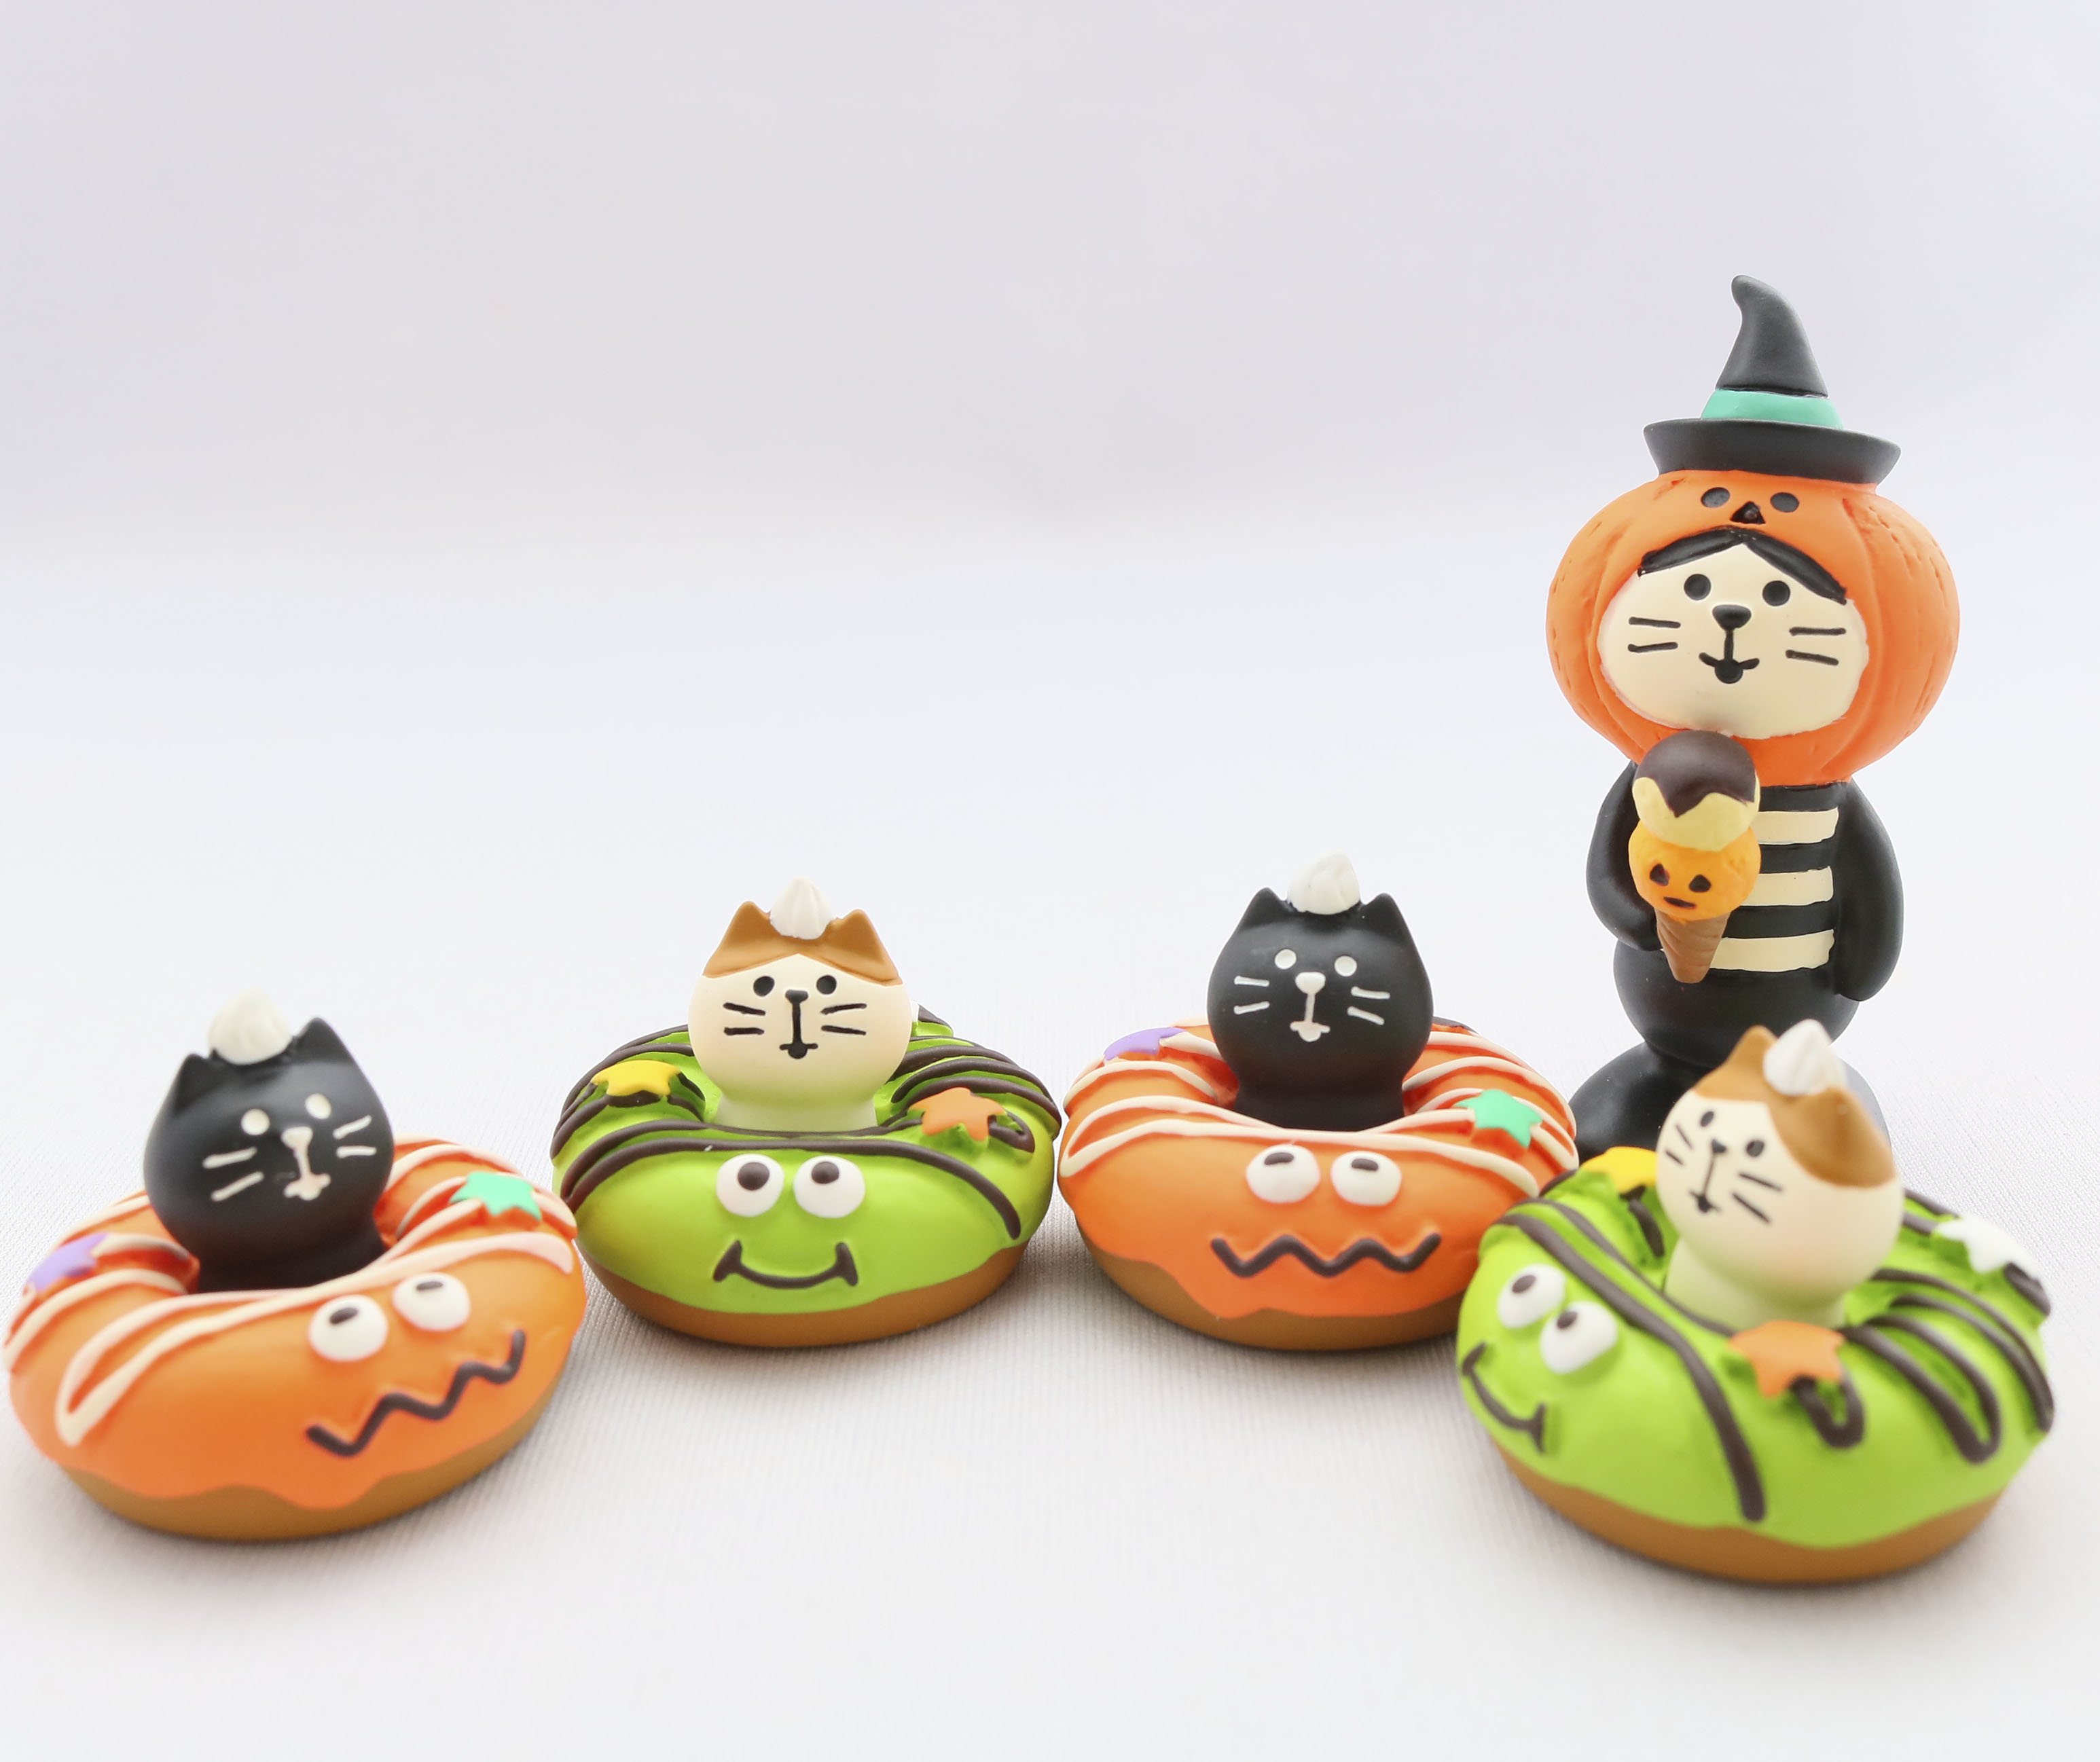 DECOLE concombre  秋田 かぎしっぽ 猫雑貨 猫グッズ